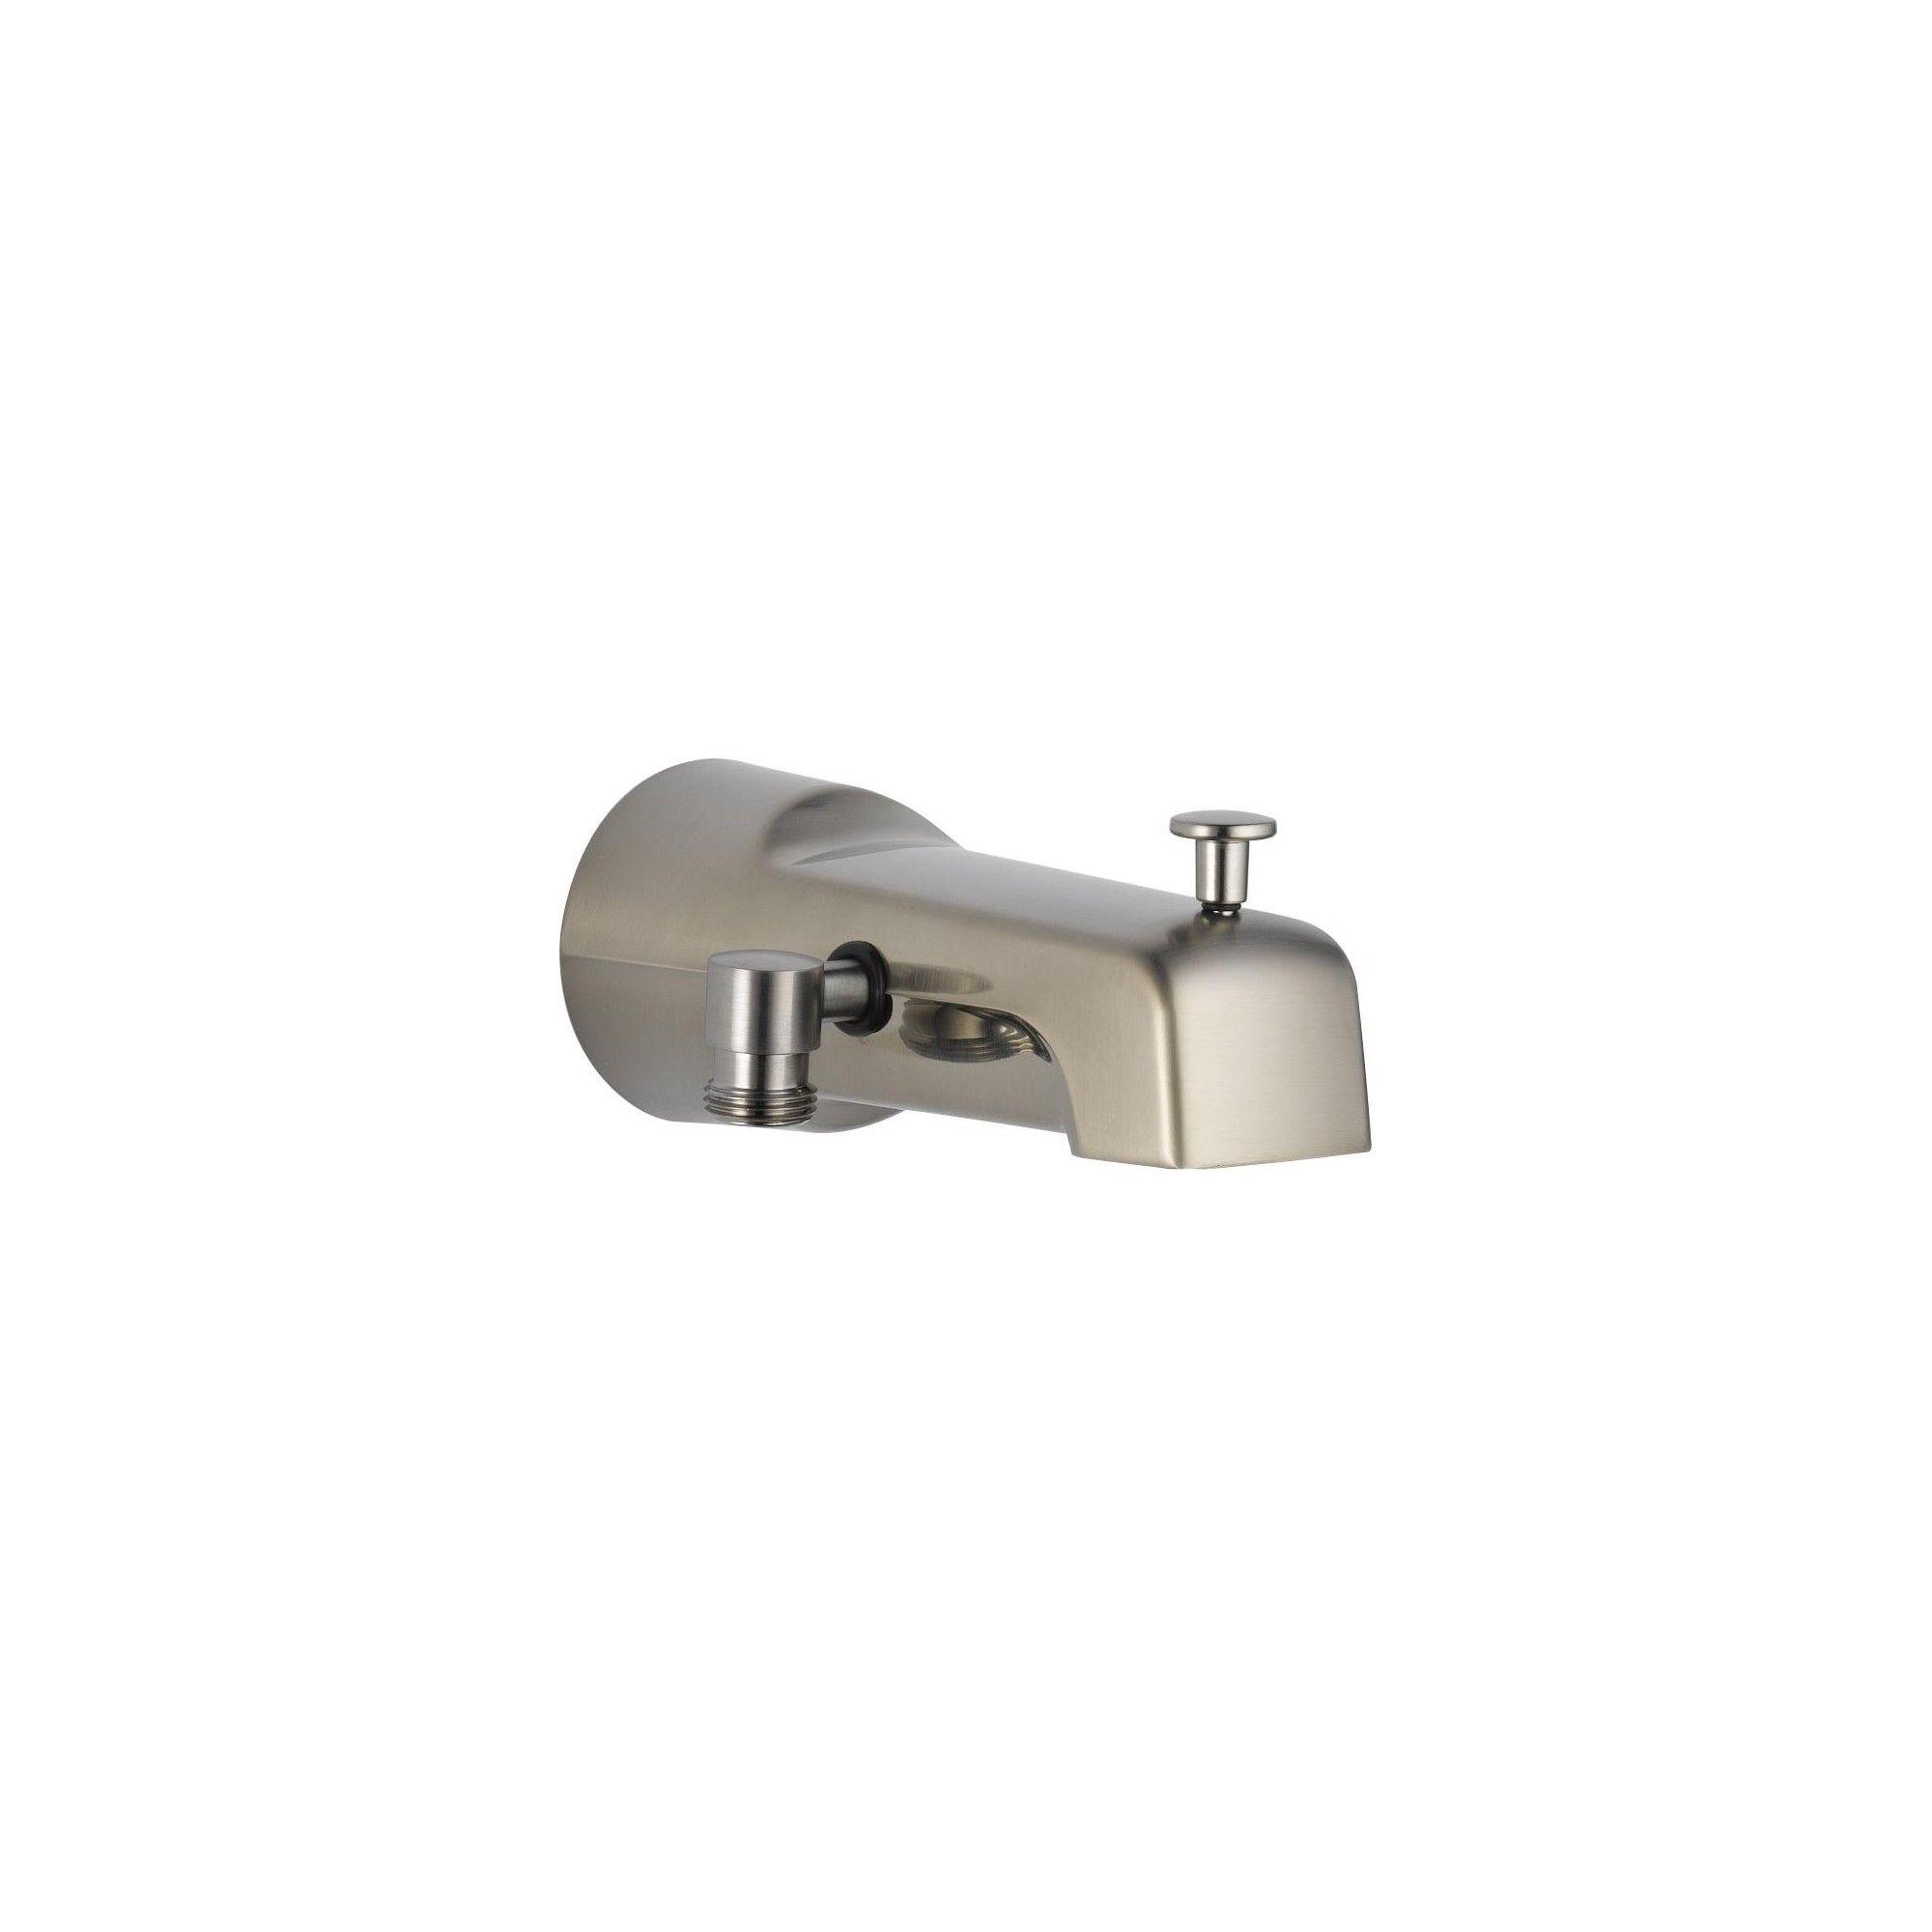 Delta Faucet U1010 Pk 6 11 16 Diverter Wall Mounted Tub Spout